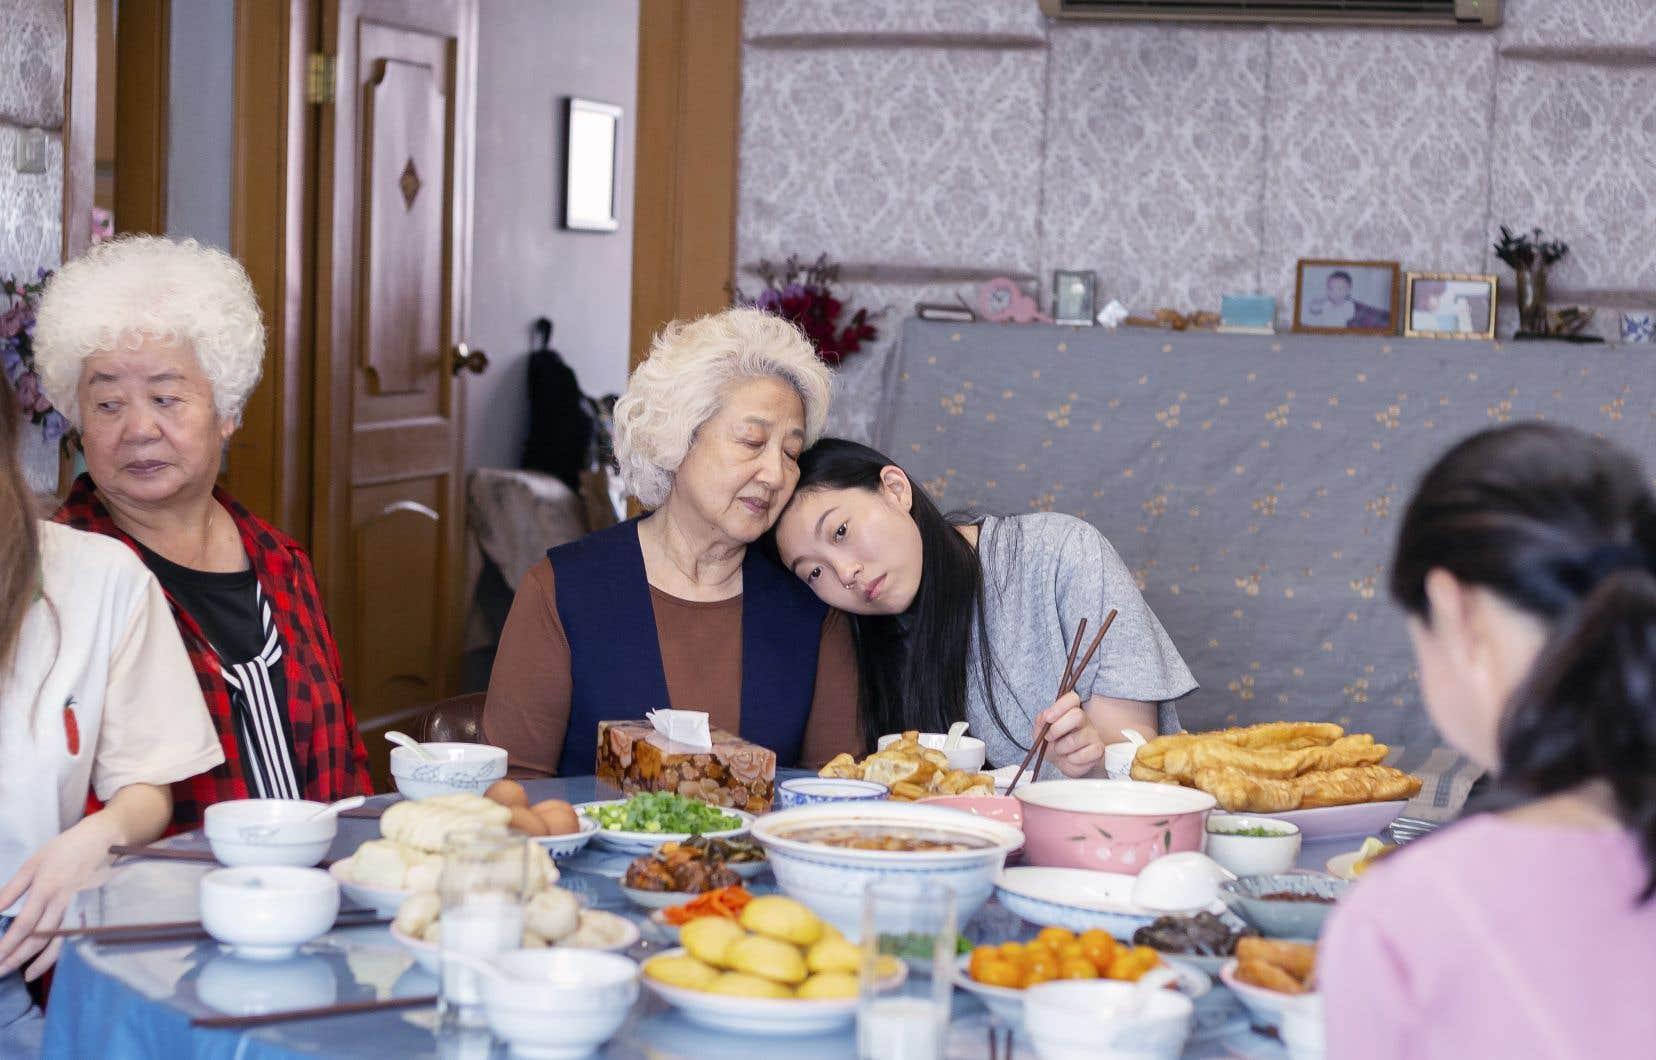 Billi (Awkwafina) et sa grand-mère, jouée par Shuzhen Zhao